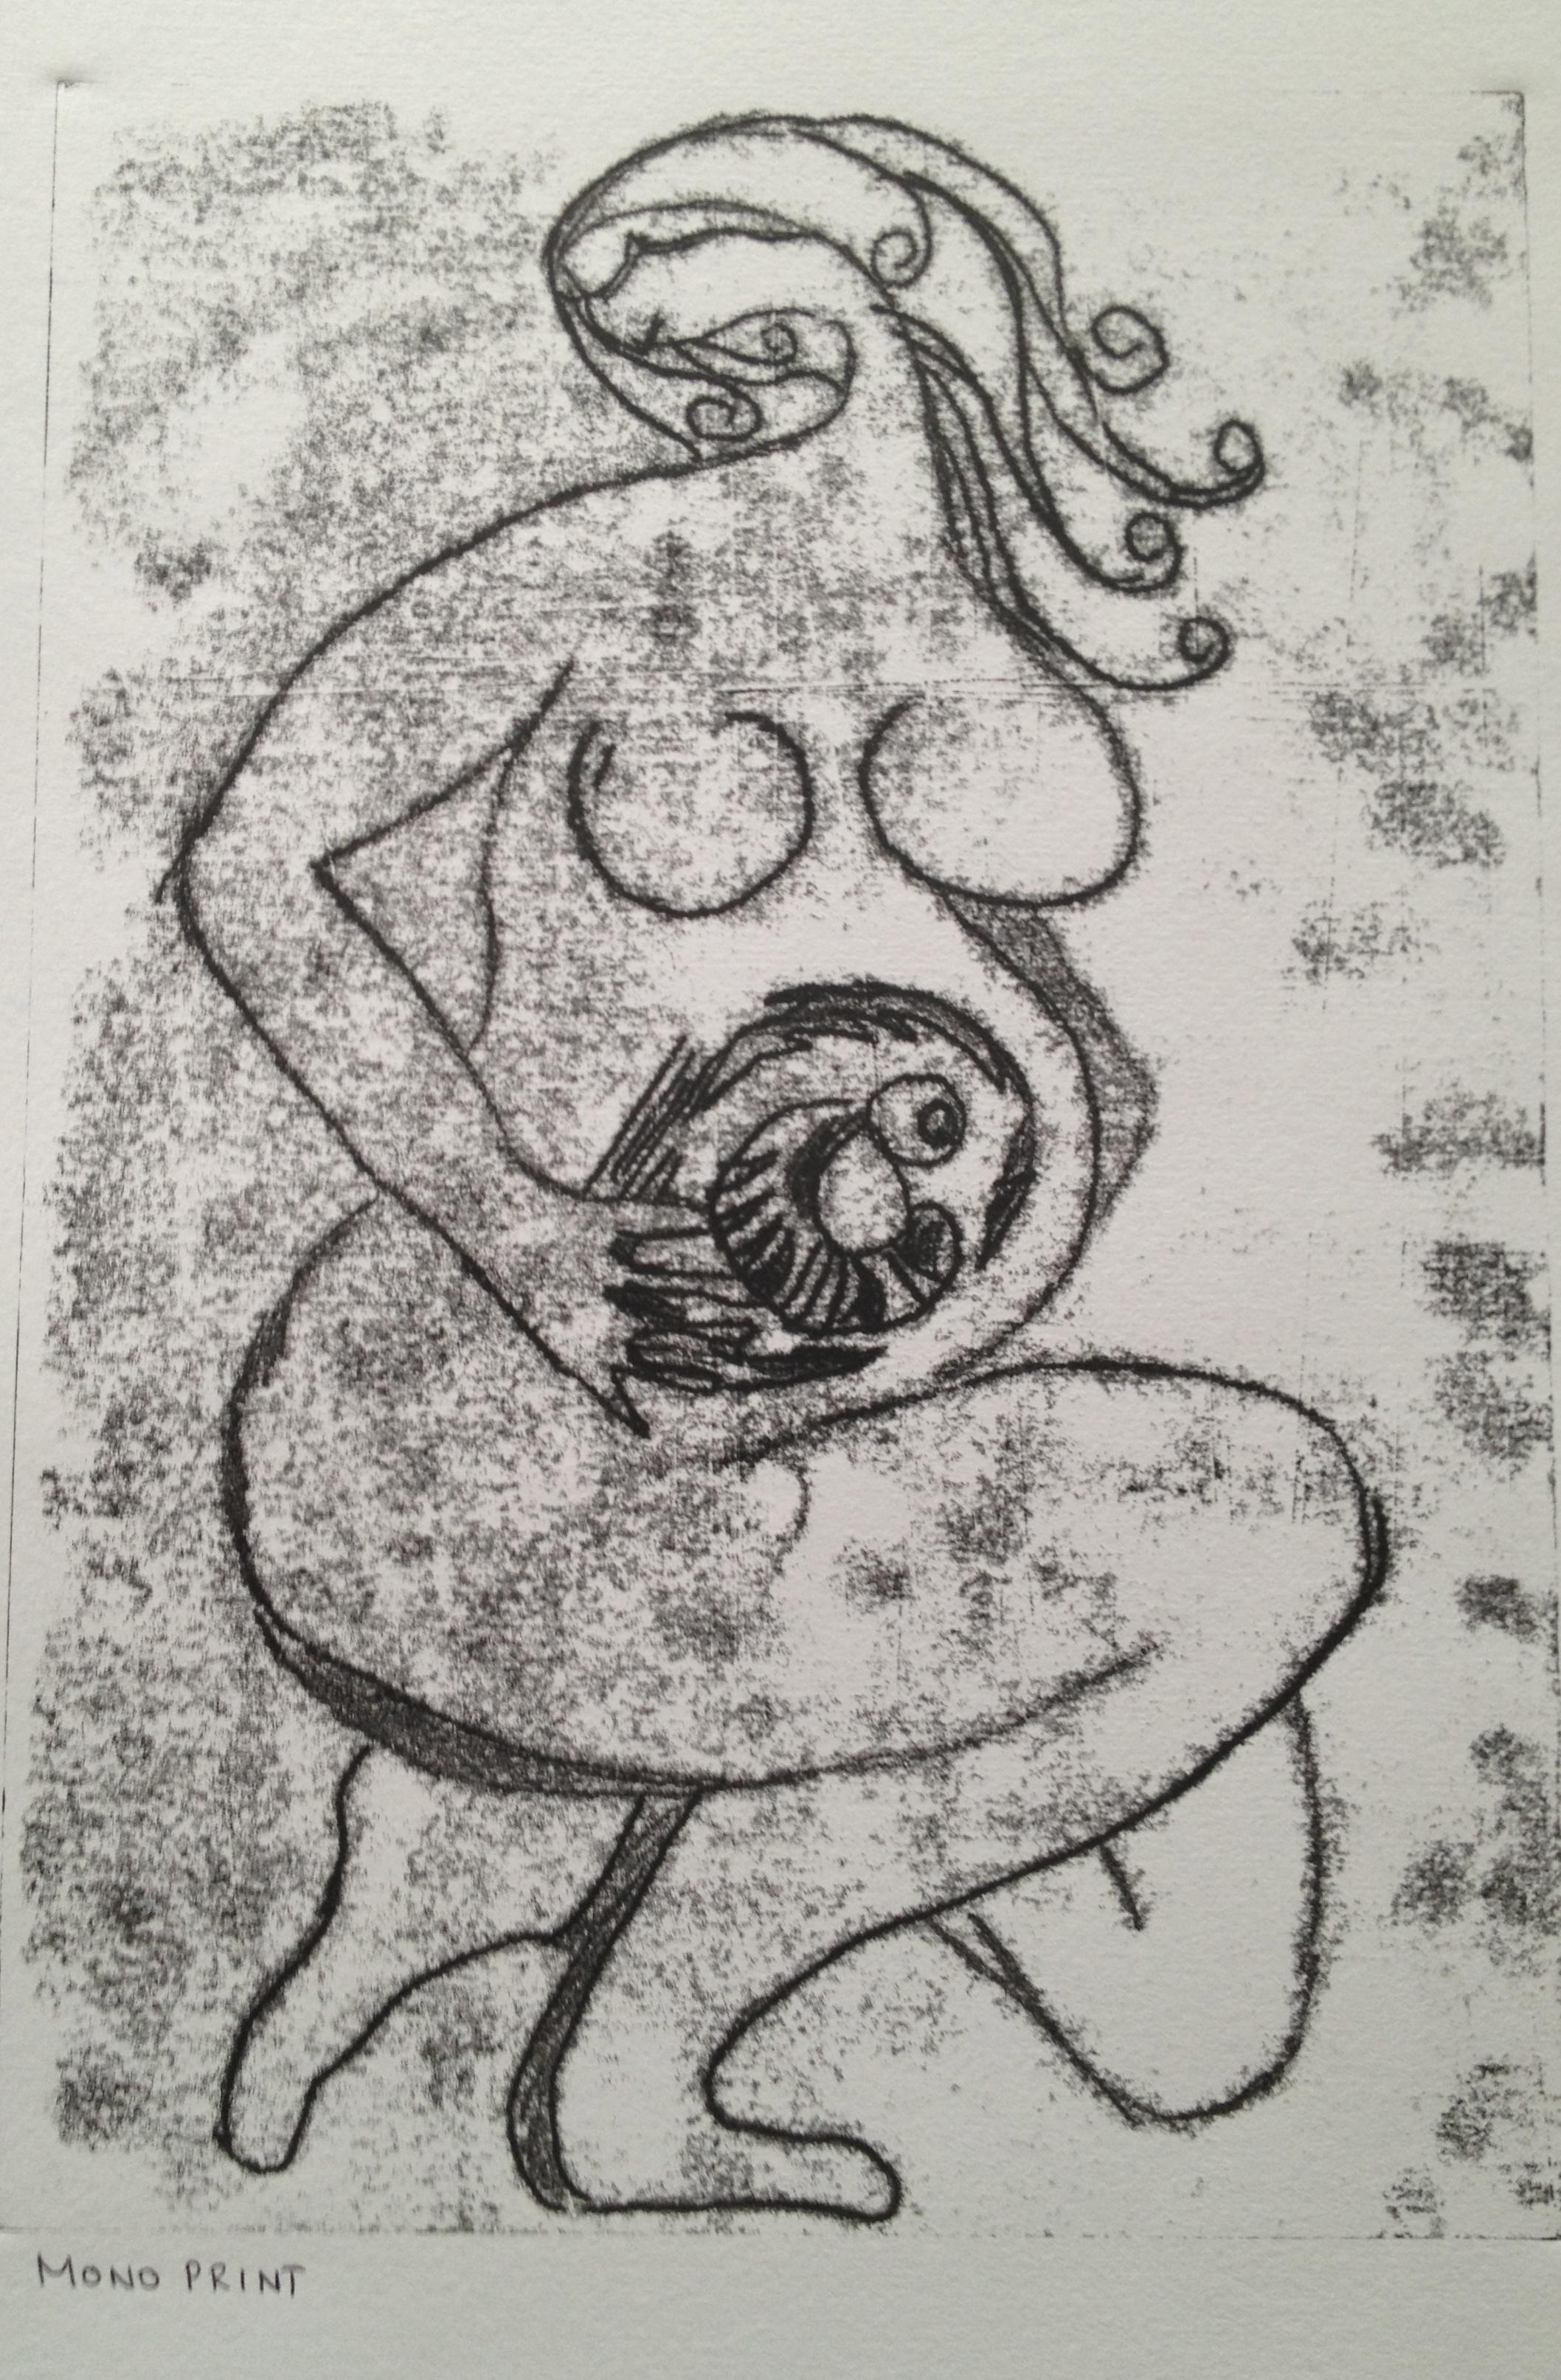 Untitled Monoprint 42 x 59.4 cms 2013